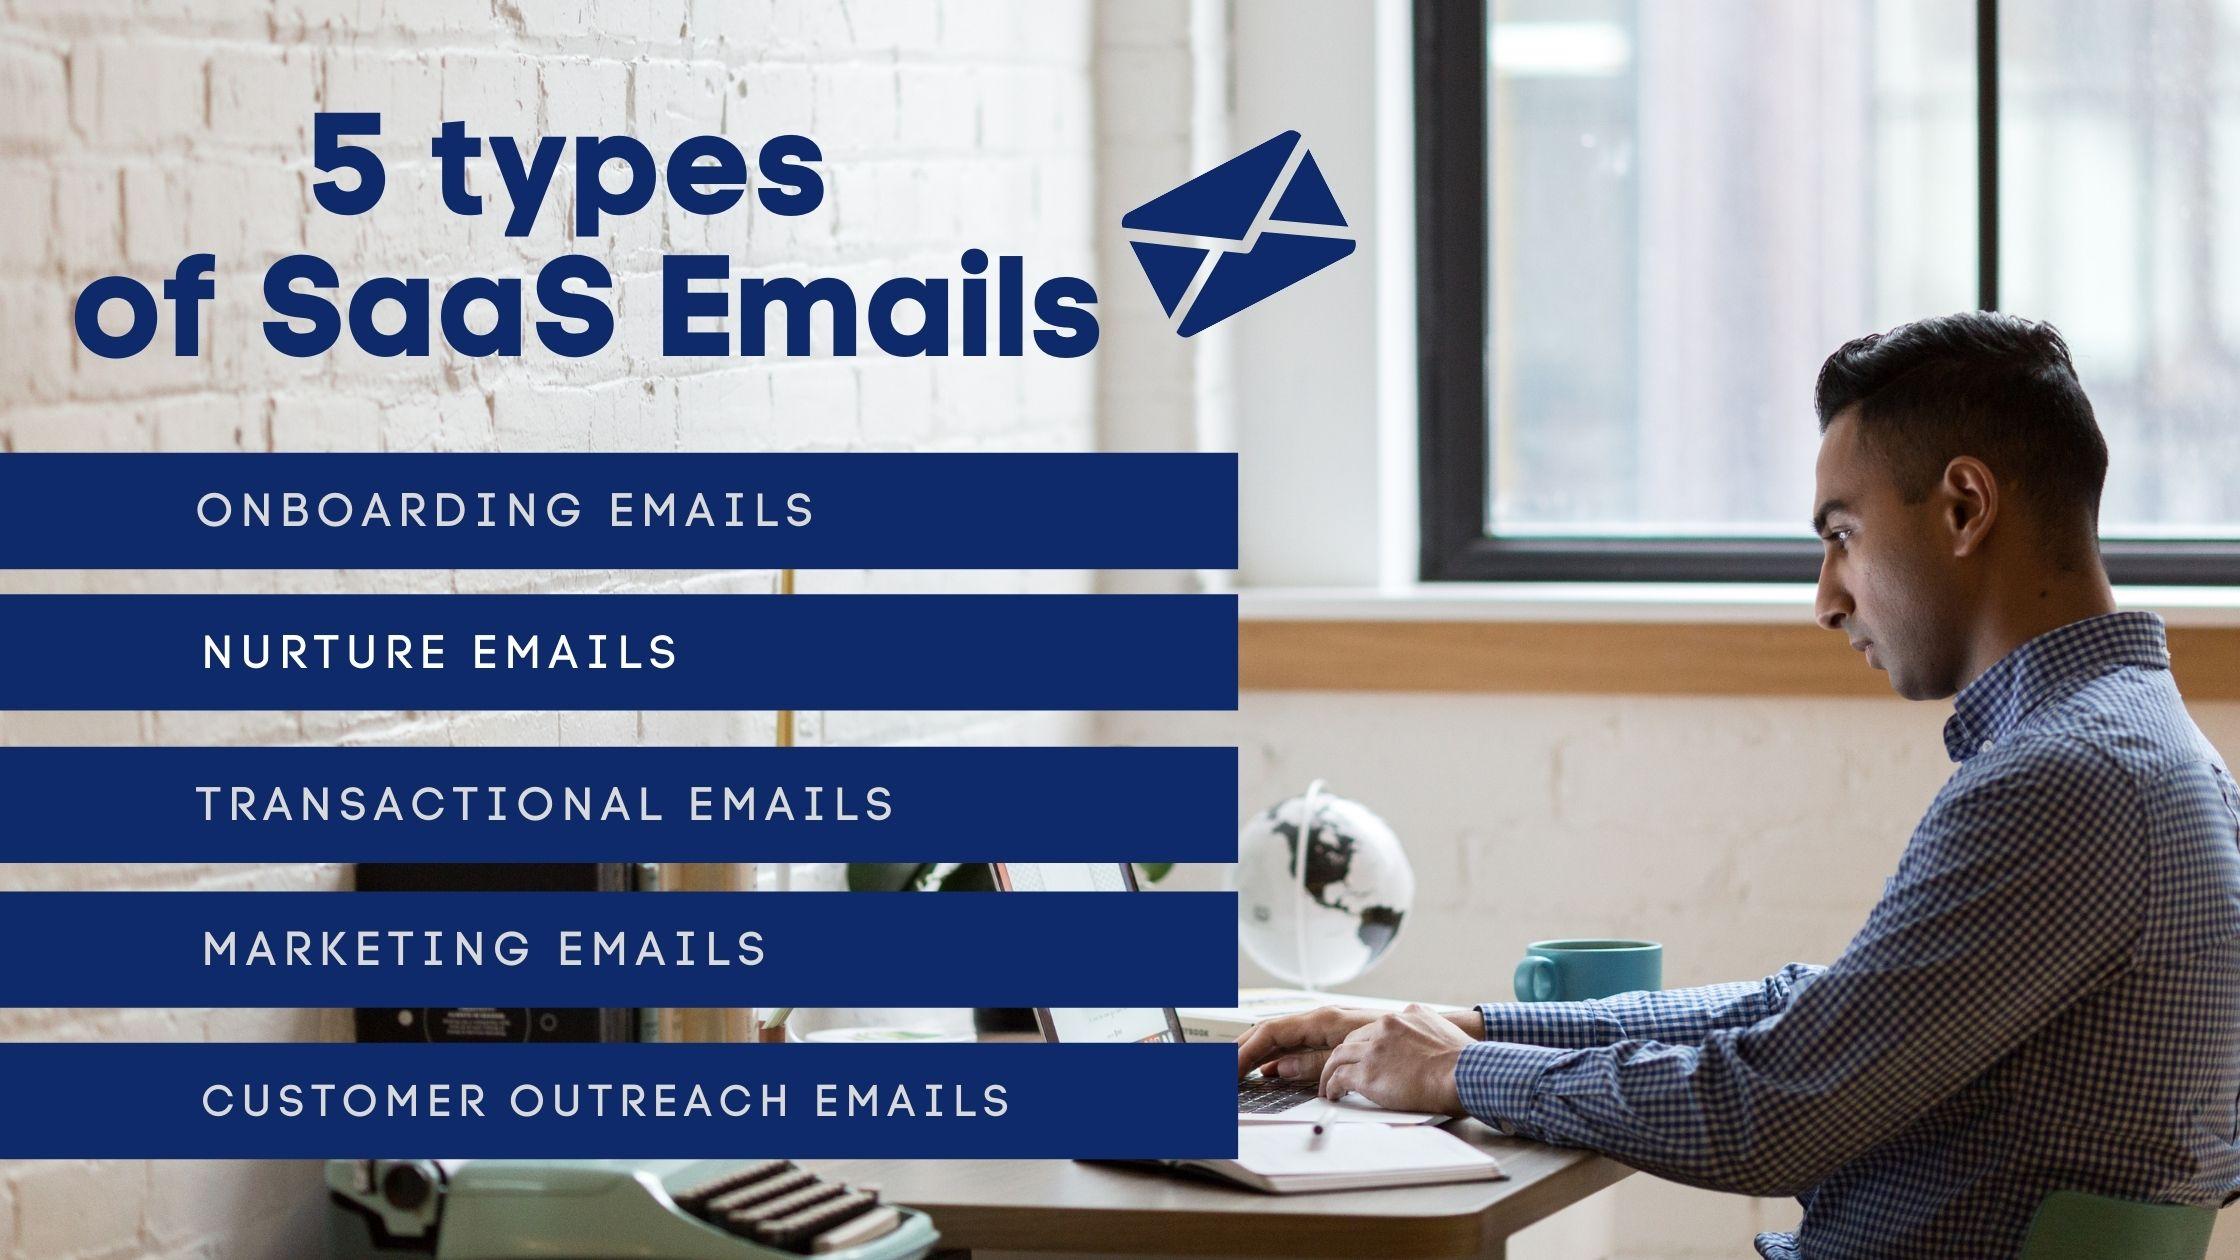 CaaSocio-5-types-of-saas-emails